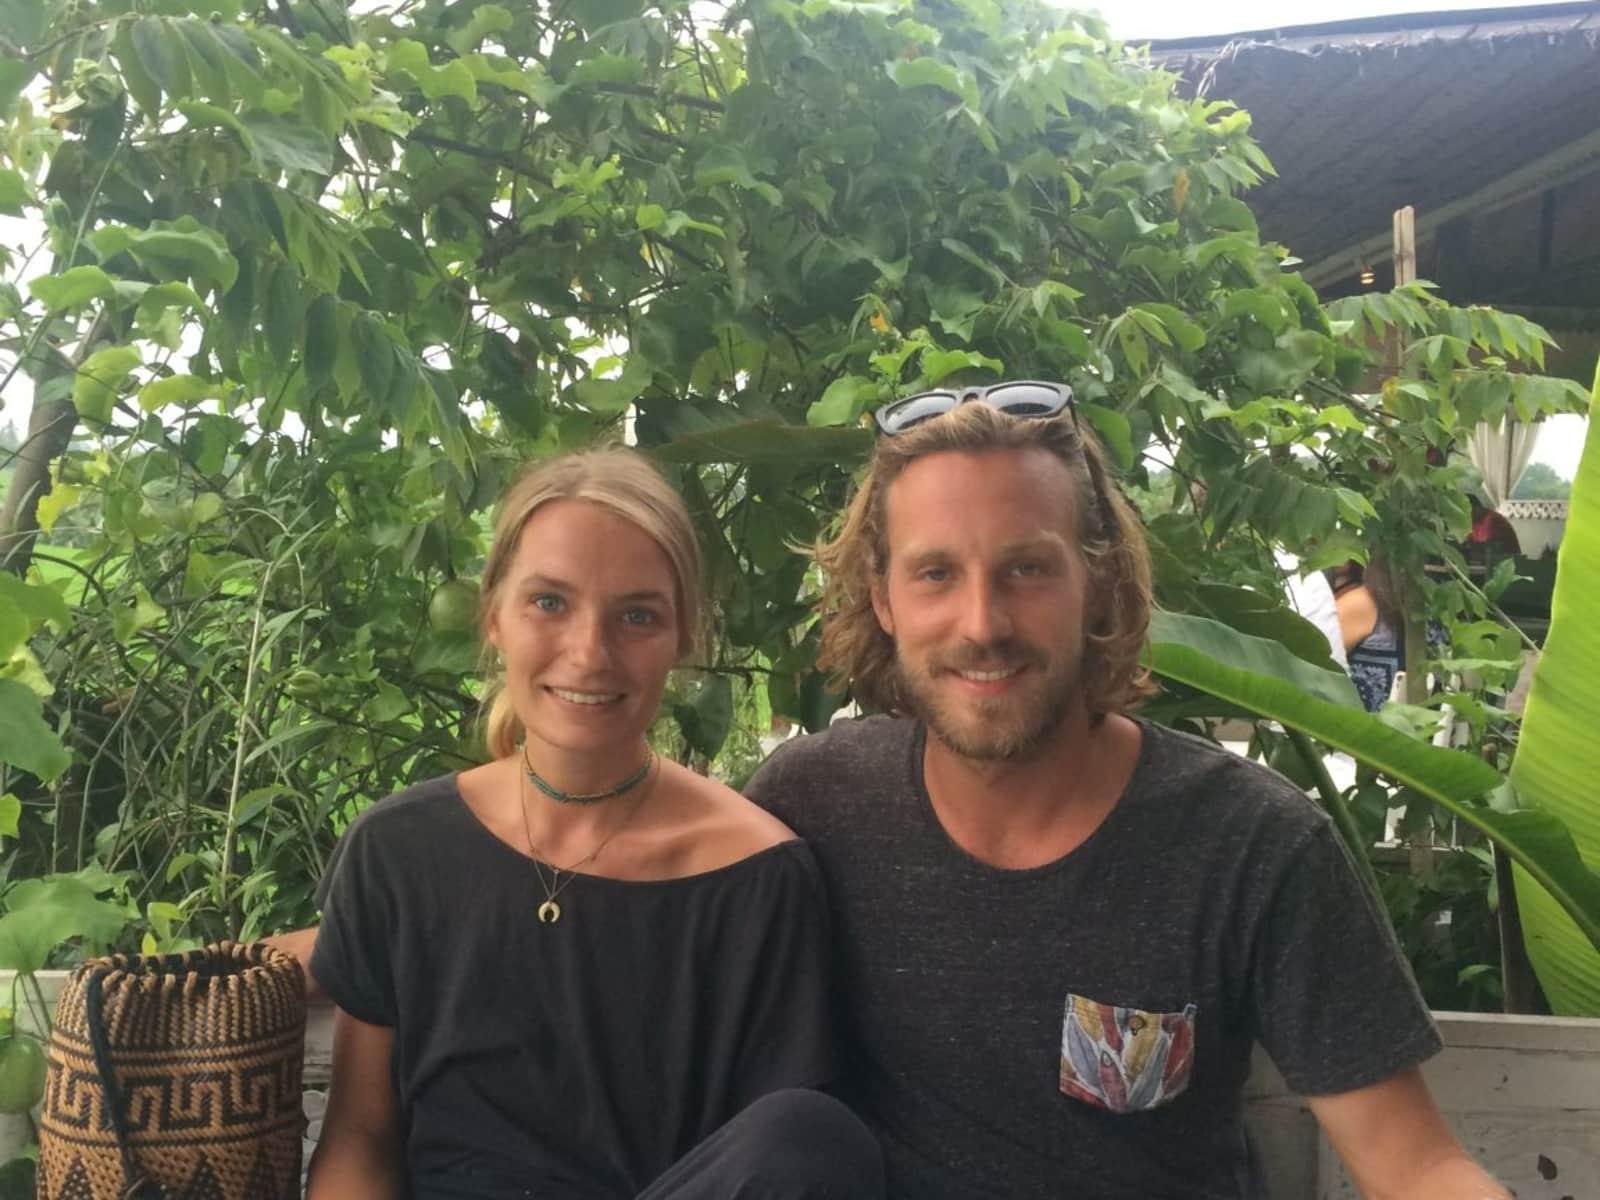 Lara & Florian from Maastricht, Netherlands